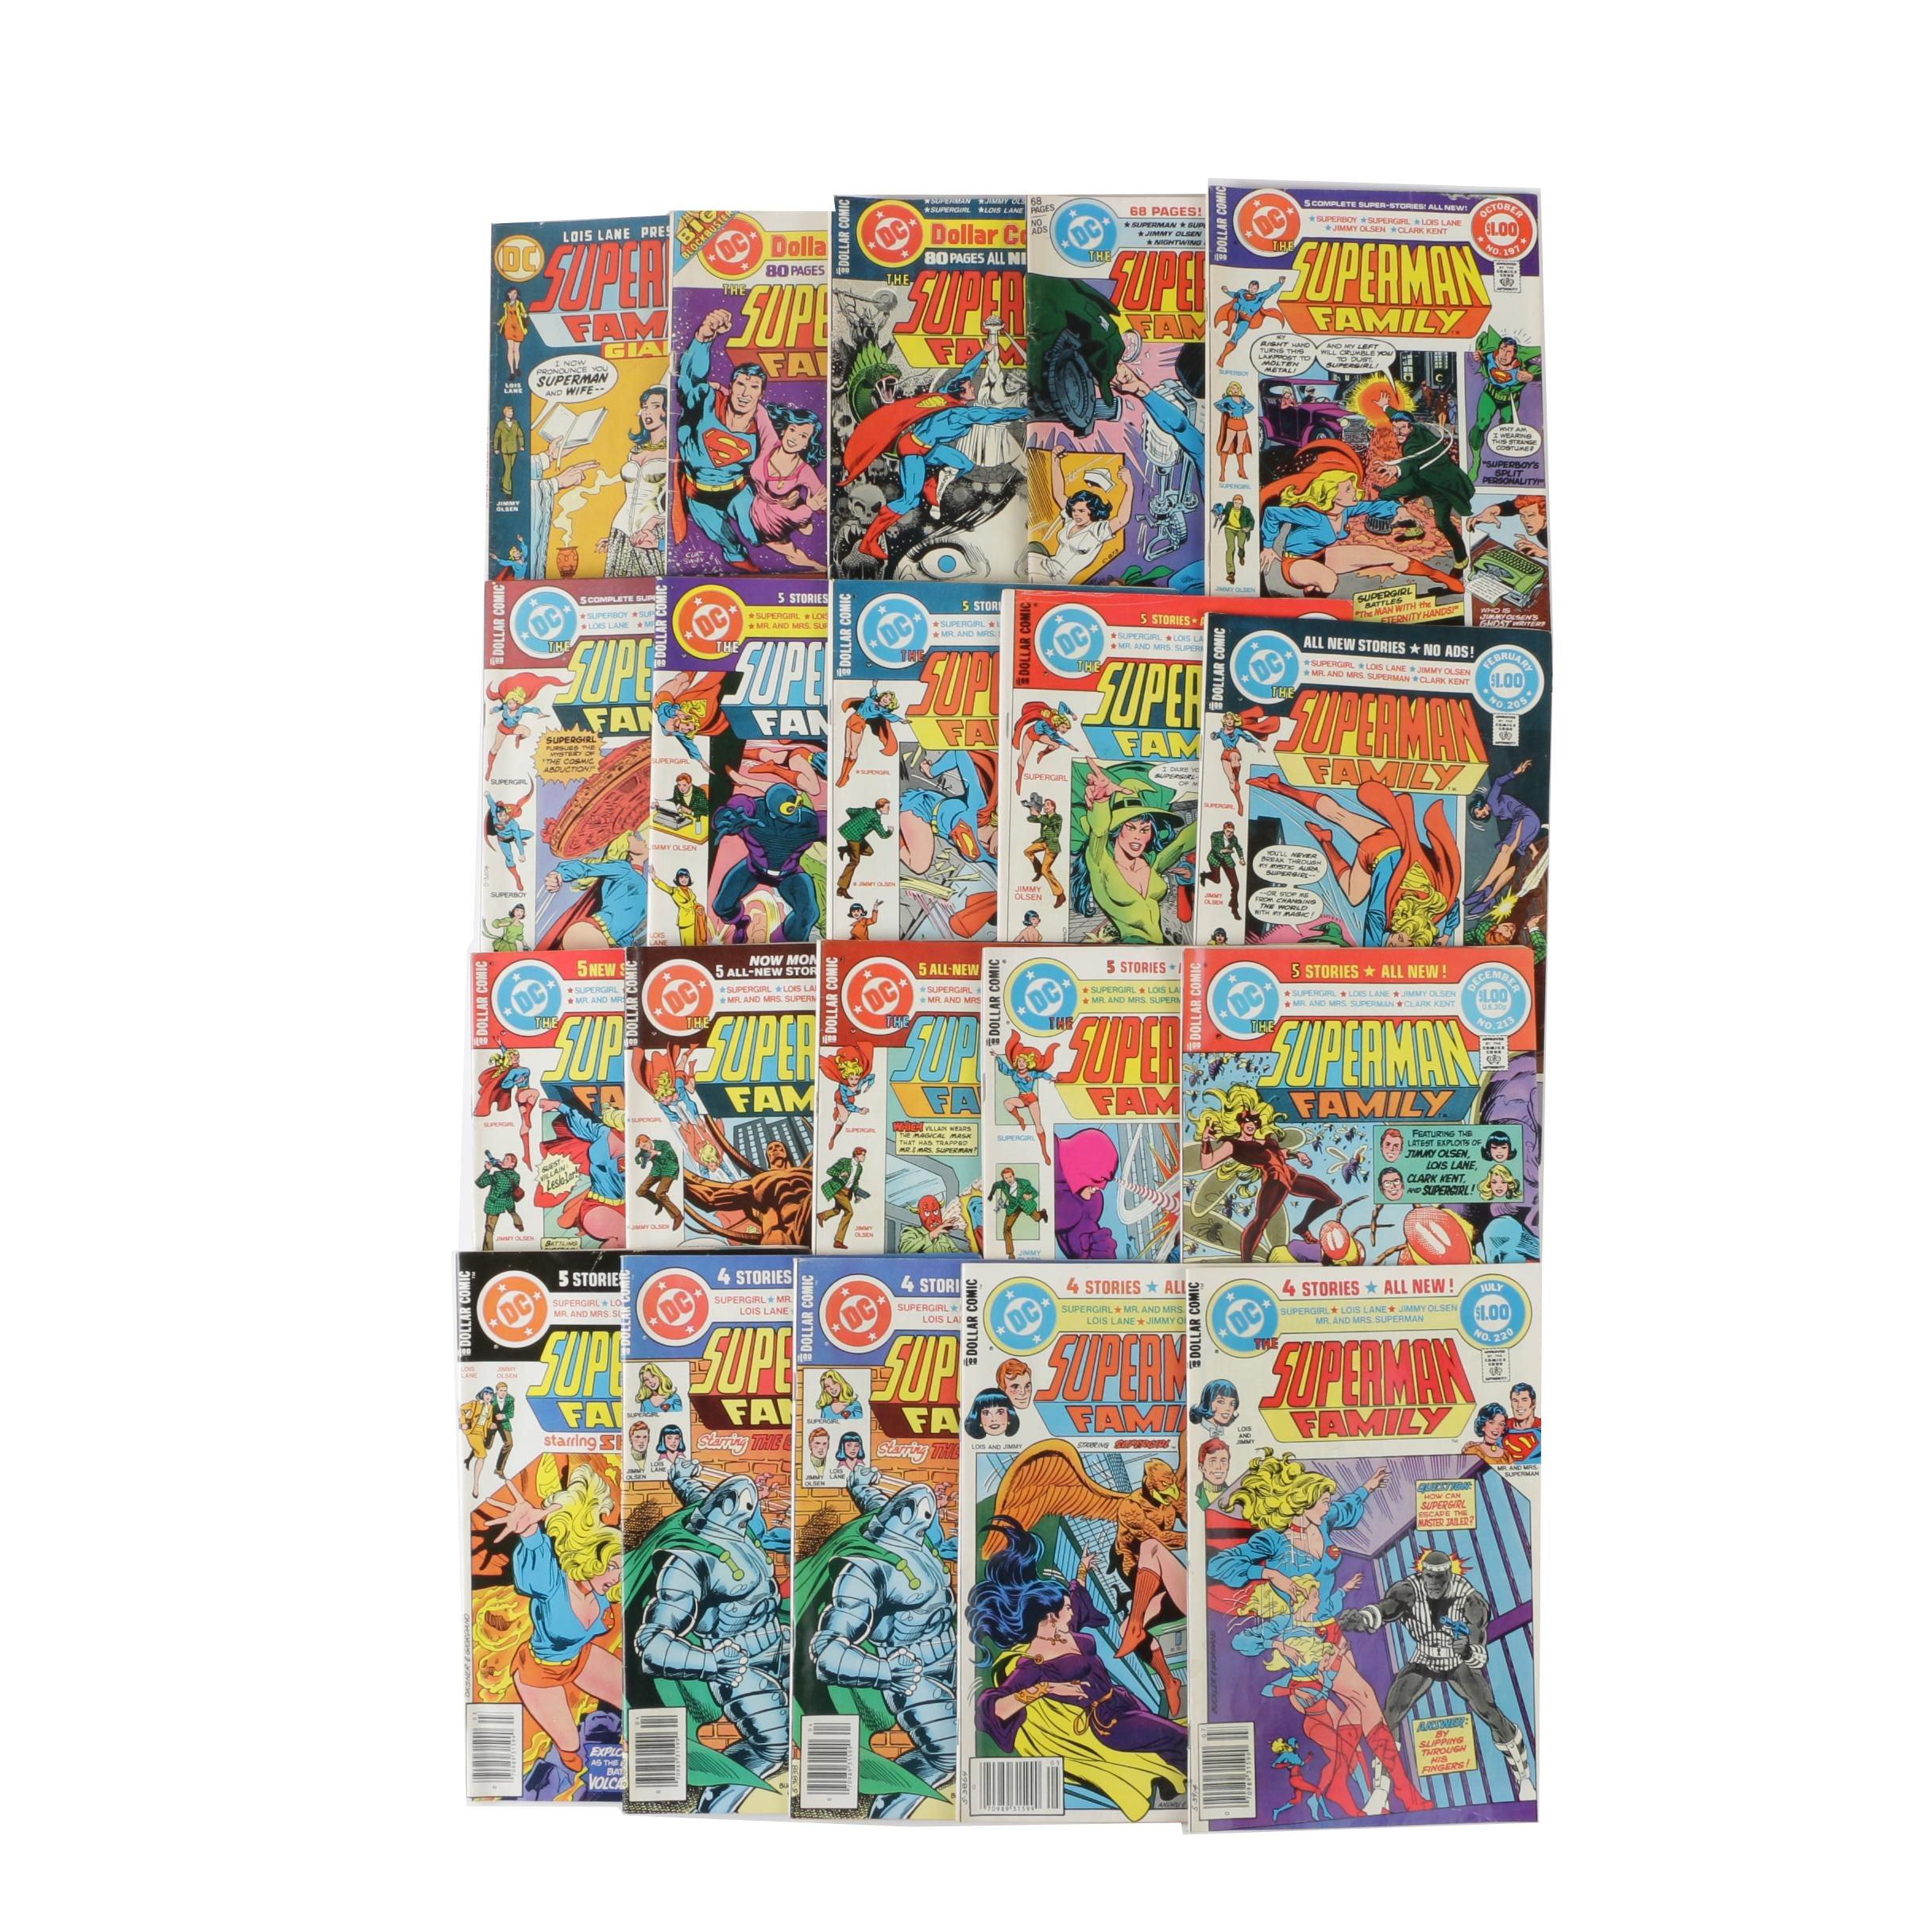 "Bronze Age DC Comics ""The Superman Family"" Comics Books, 1970s-80s"